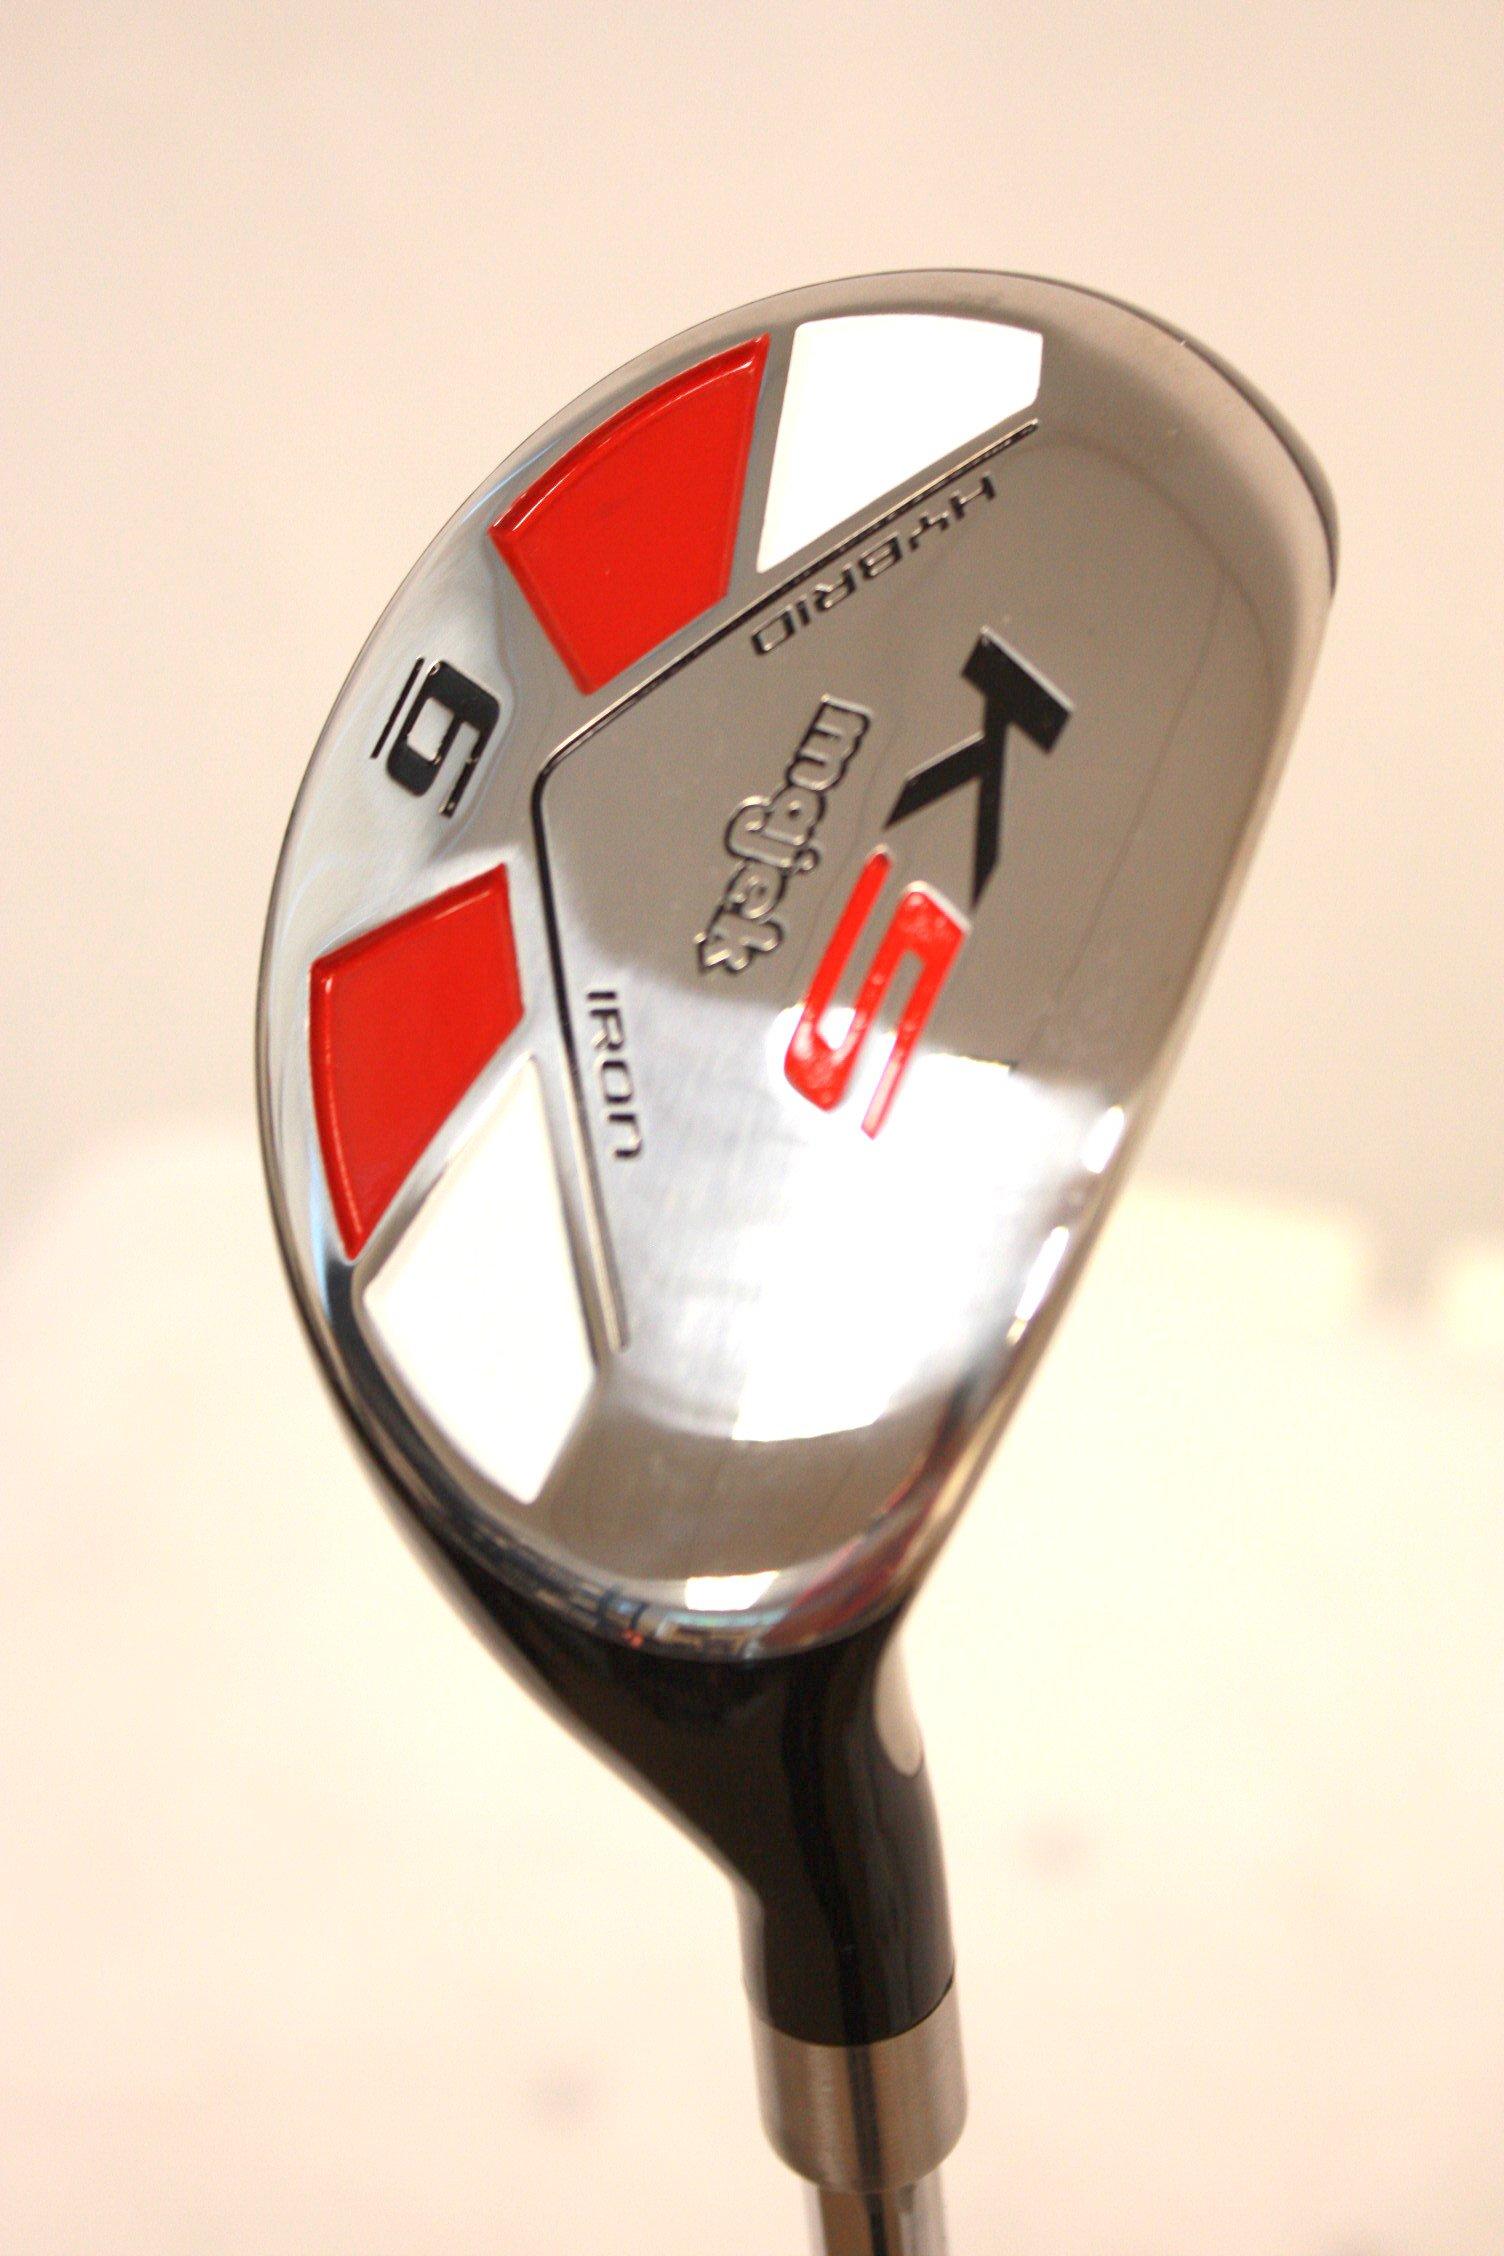 Majek Golf All Hybrid #6 Regular Flex Right Handed New Utility R Flex Club by Majek